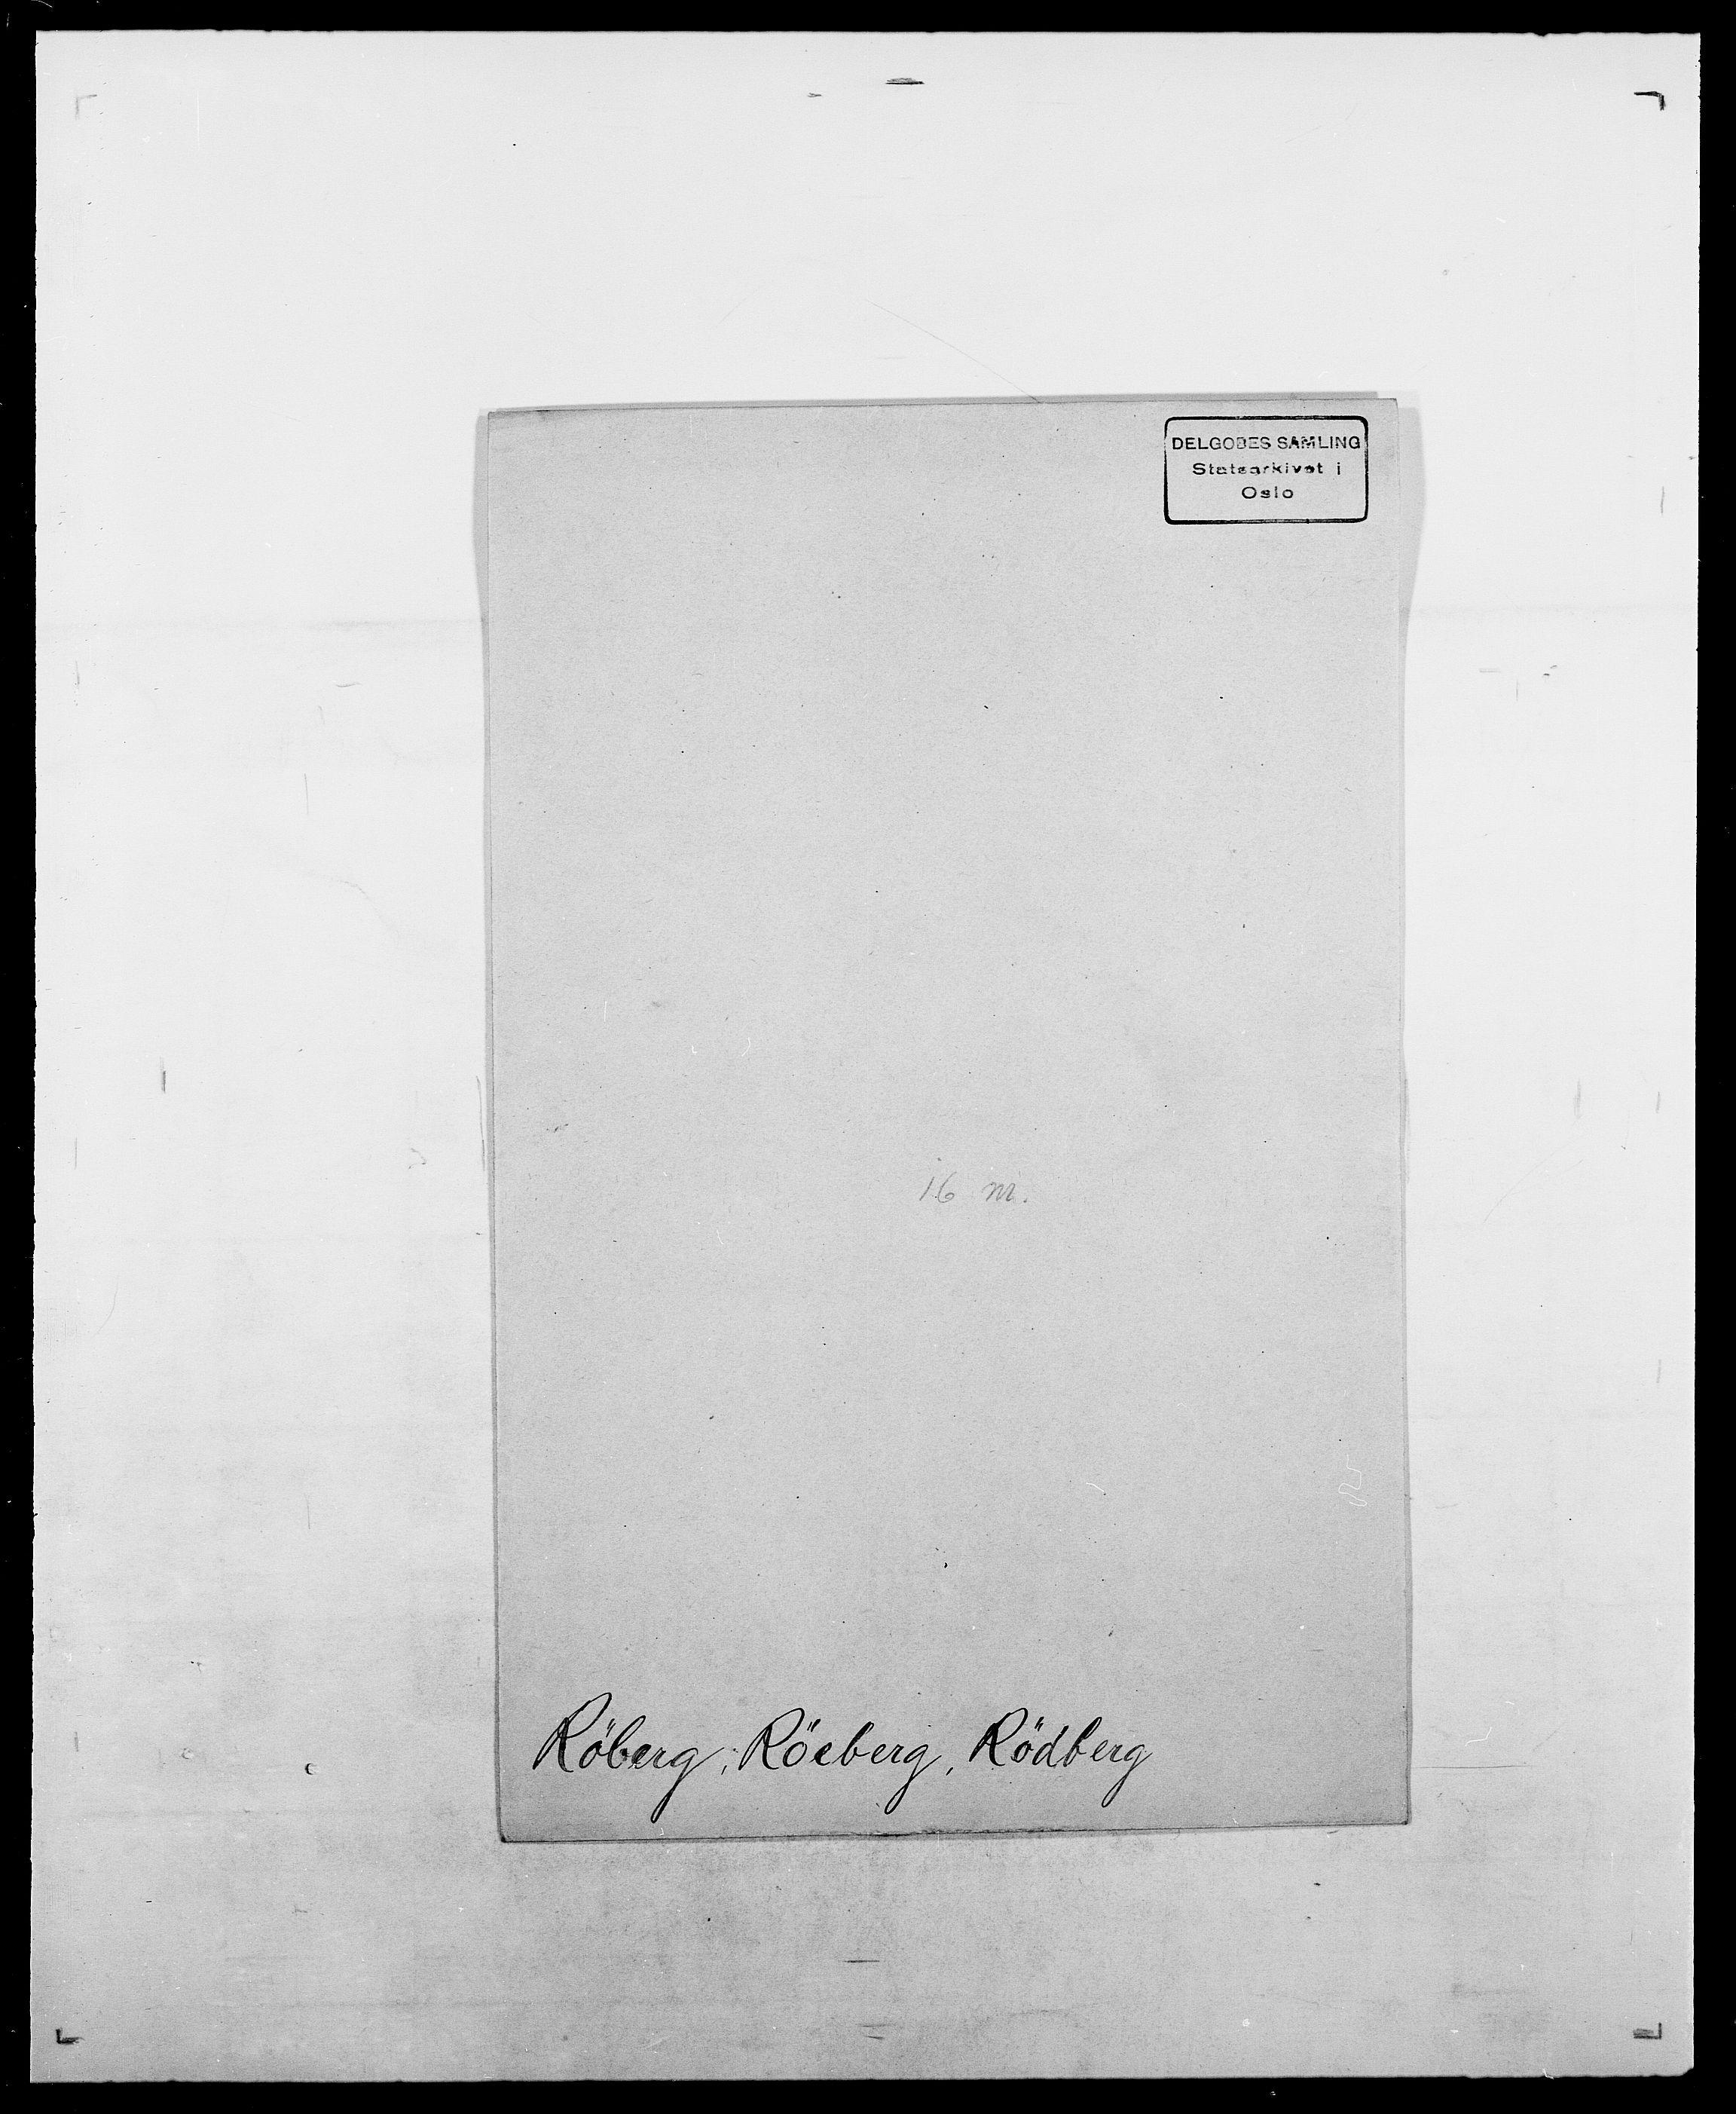 SAO, Delgobe, Charles Antoine - samling, D/Da/L0033: Roald - Røyem, s. 624